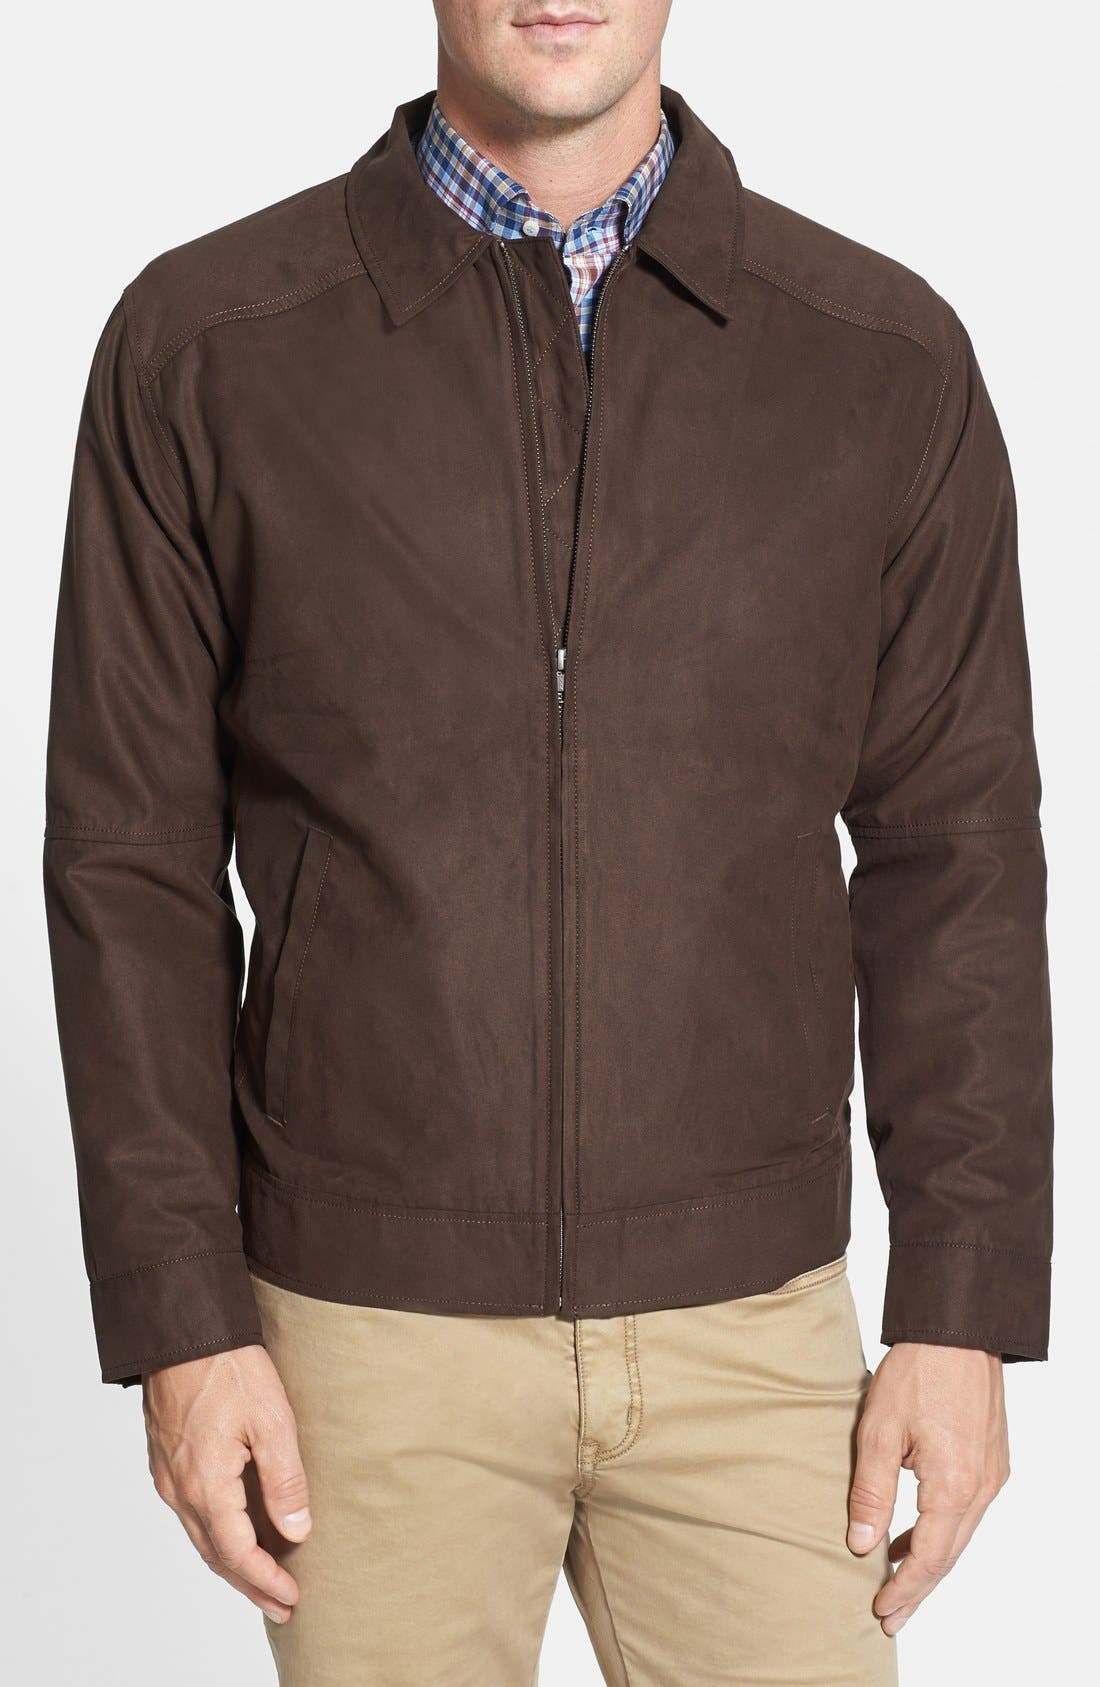 Cutter & Buck Roosevelt Water Resistant Full Zip Jacket